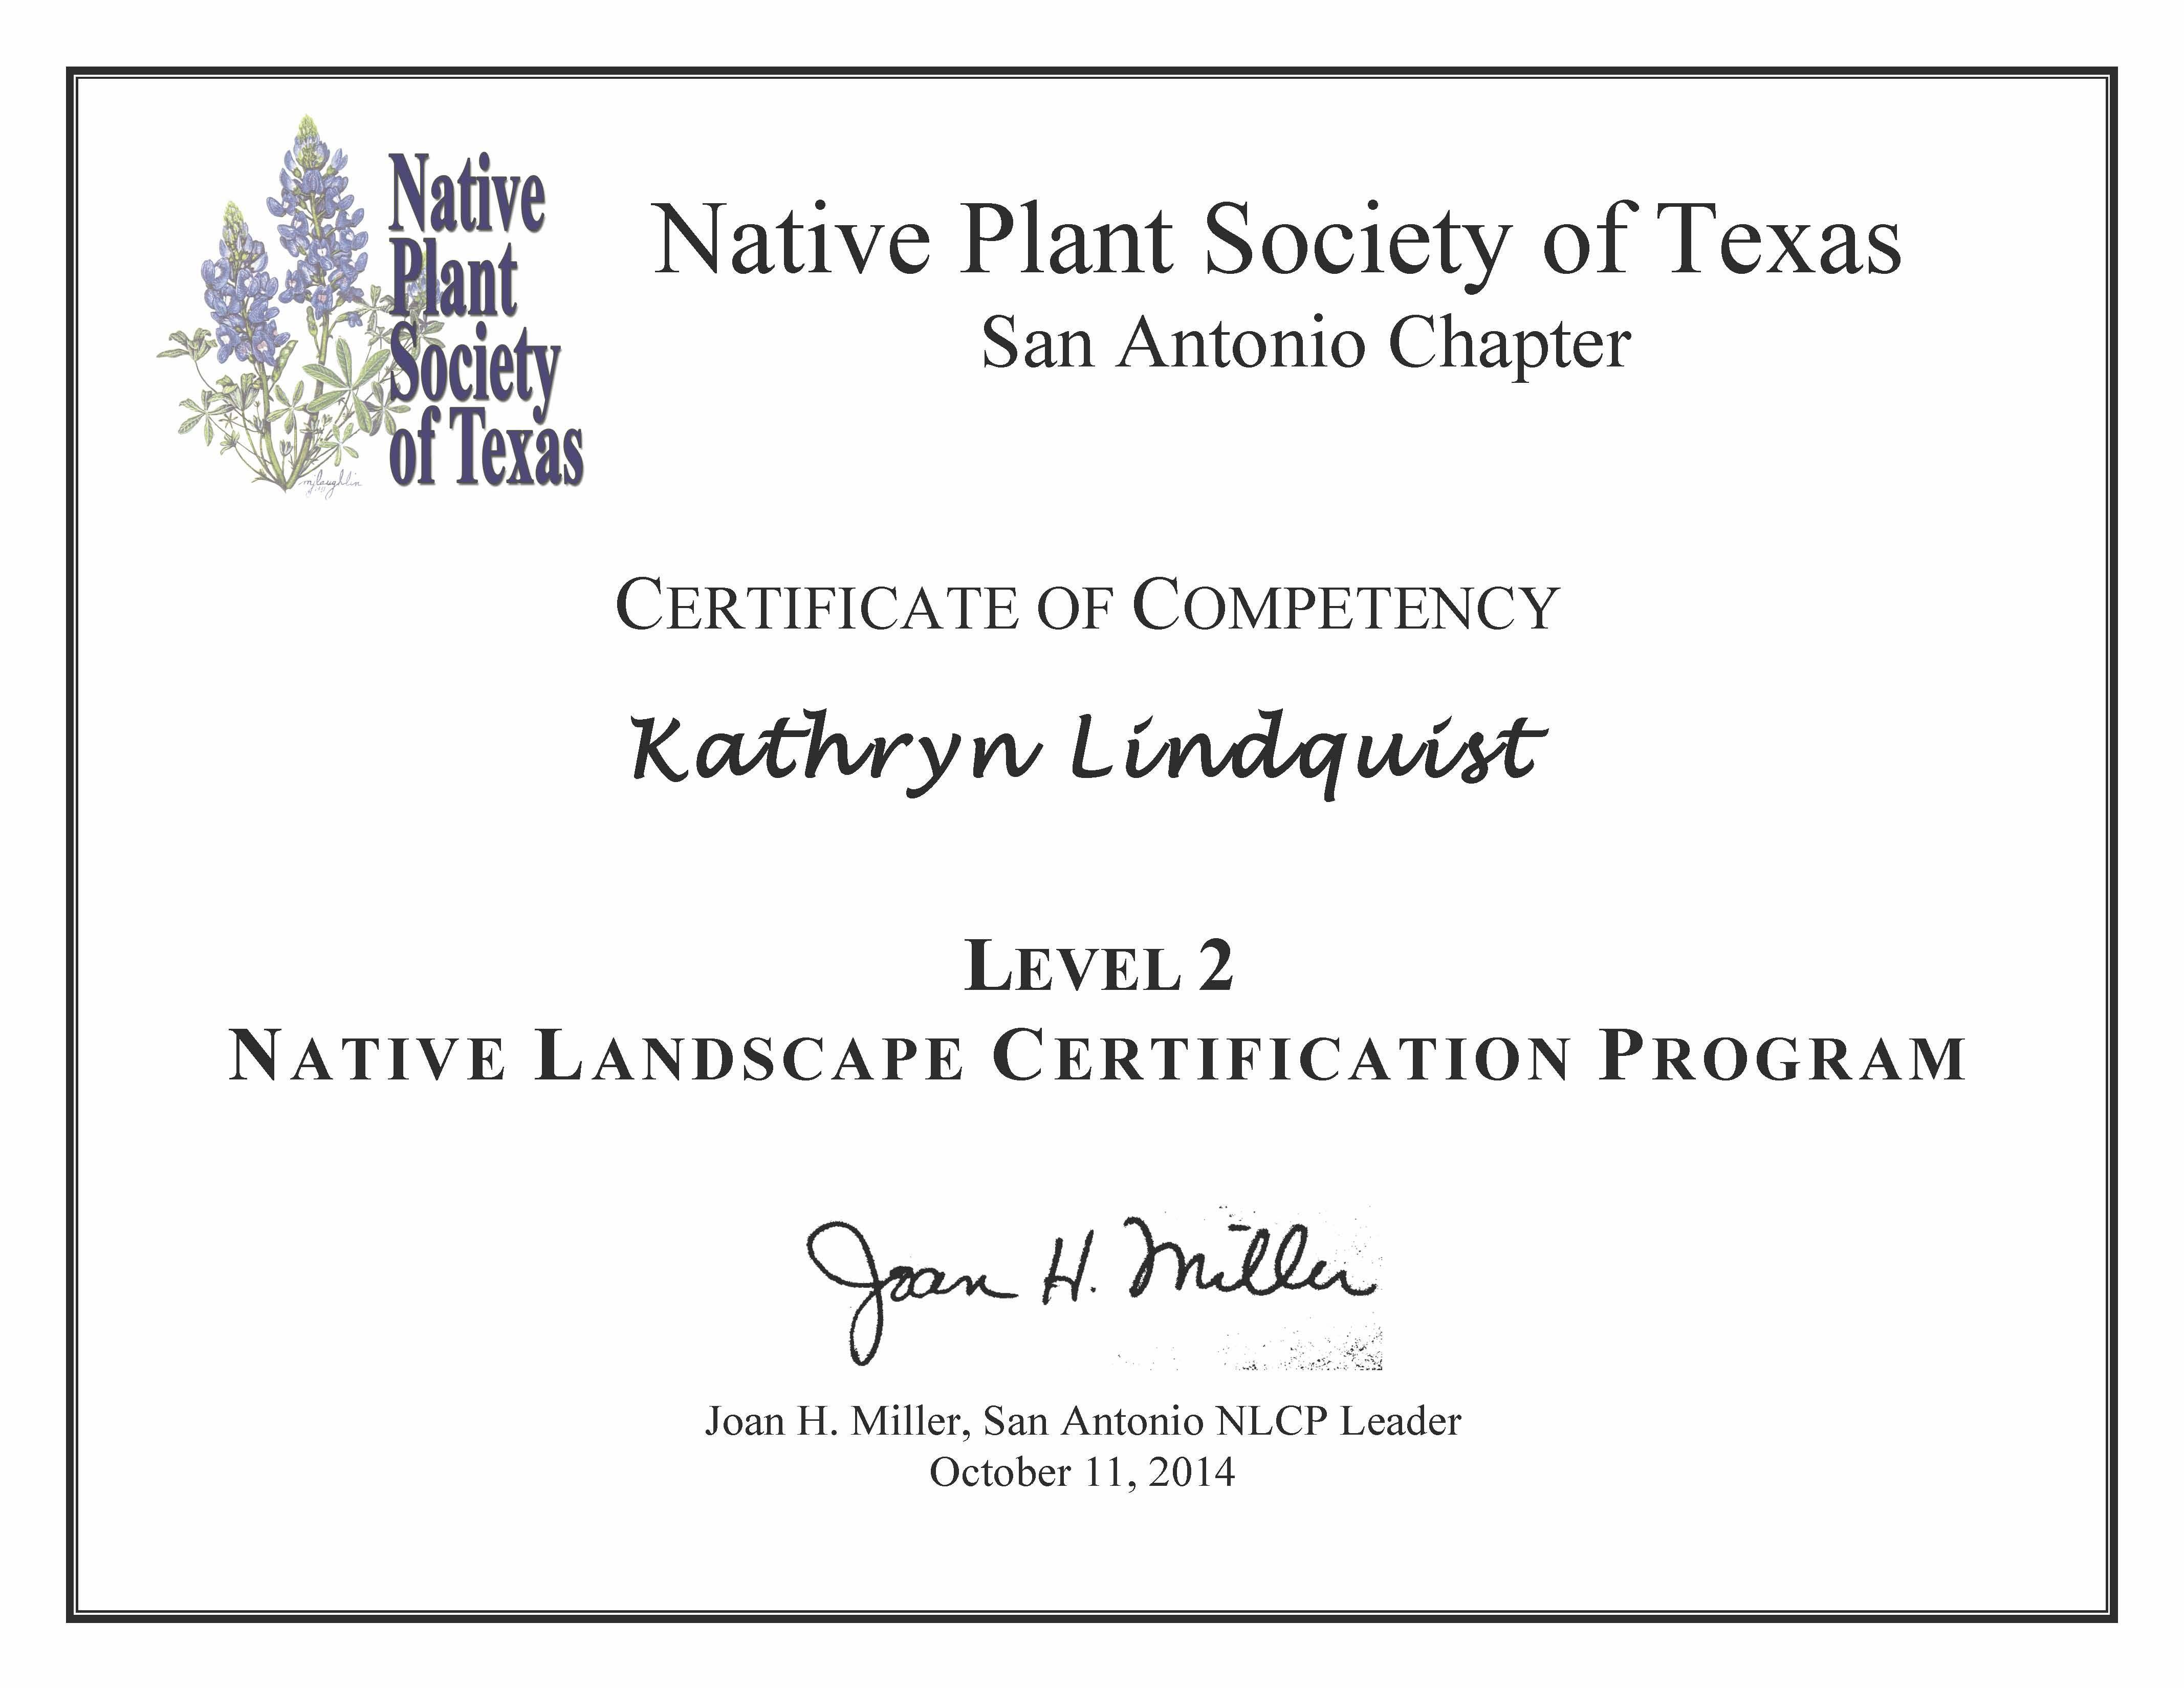 Landscape design certificate programs florida bathroom design landscape design certificate programs florida 1betcityfo Choice Image